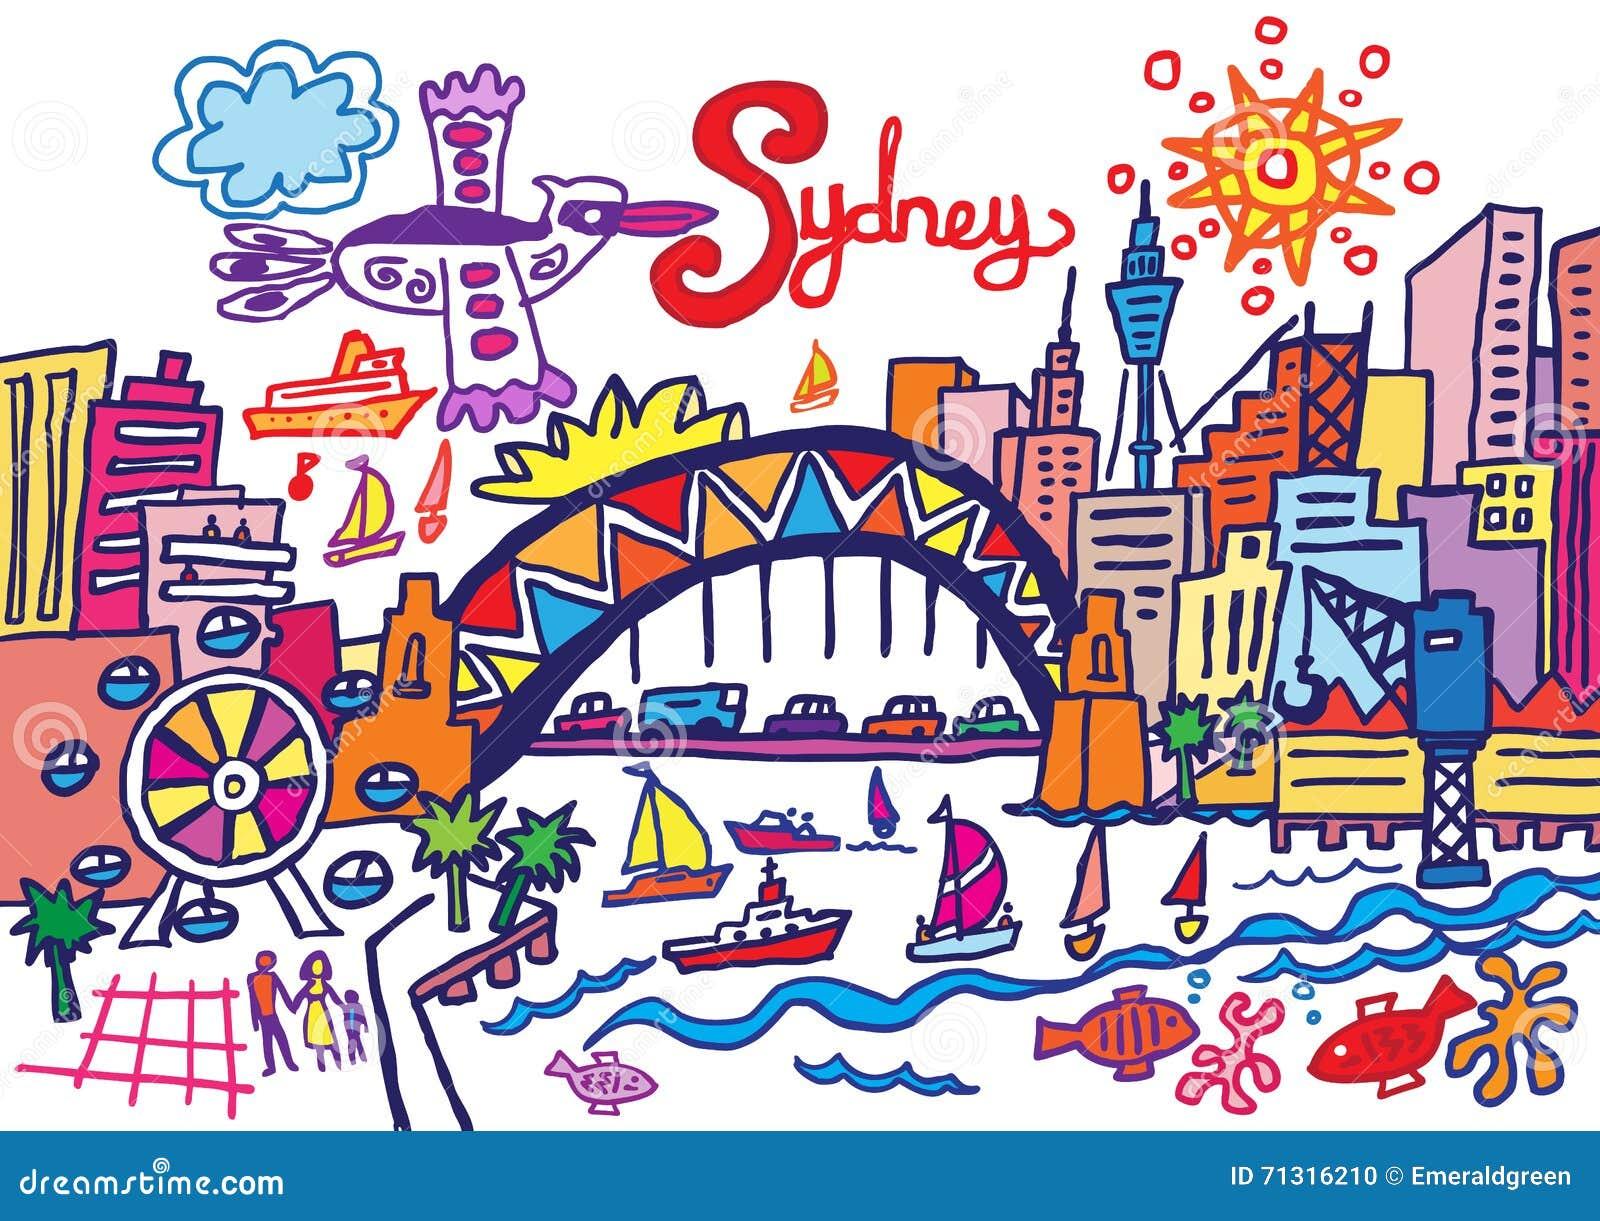 Sydney Cartoons, Illustrations & Vector Stock Images - 851 ...